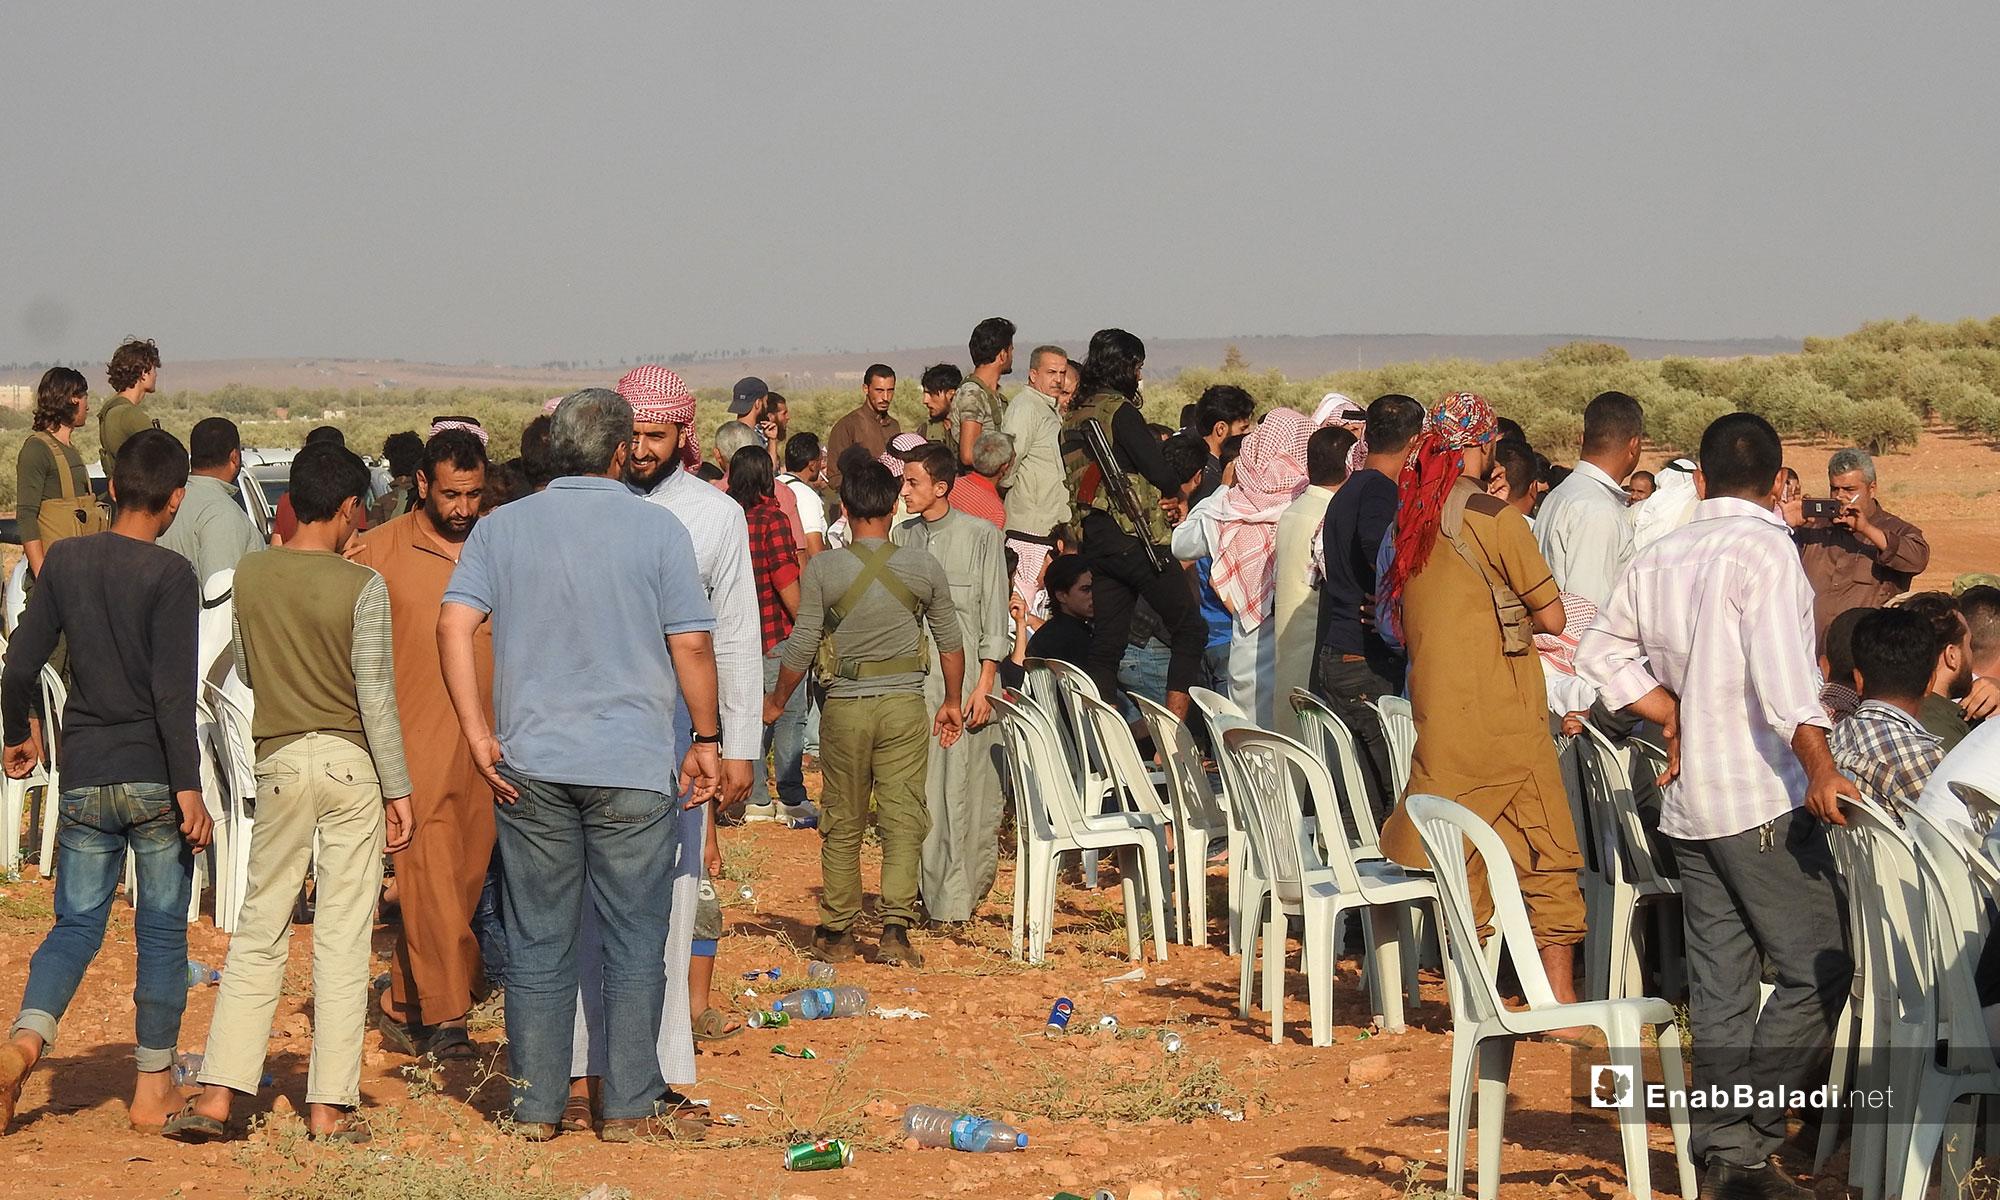 Al-Asala Arabian Horse Festival in Rural Aleppo – September 9, 2018 (Enab Baladi)